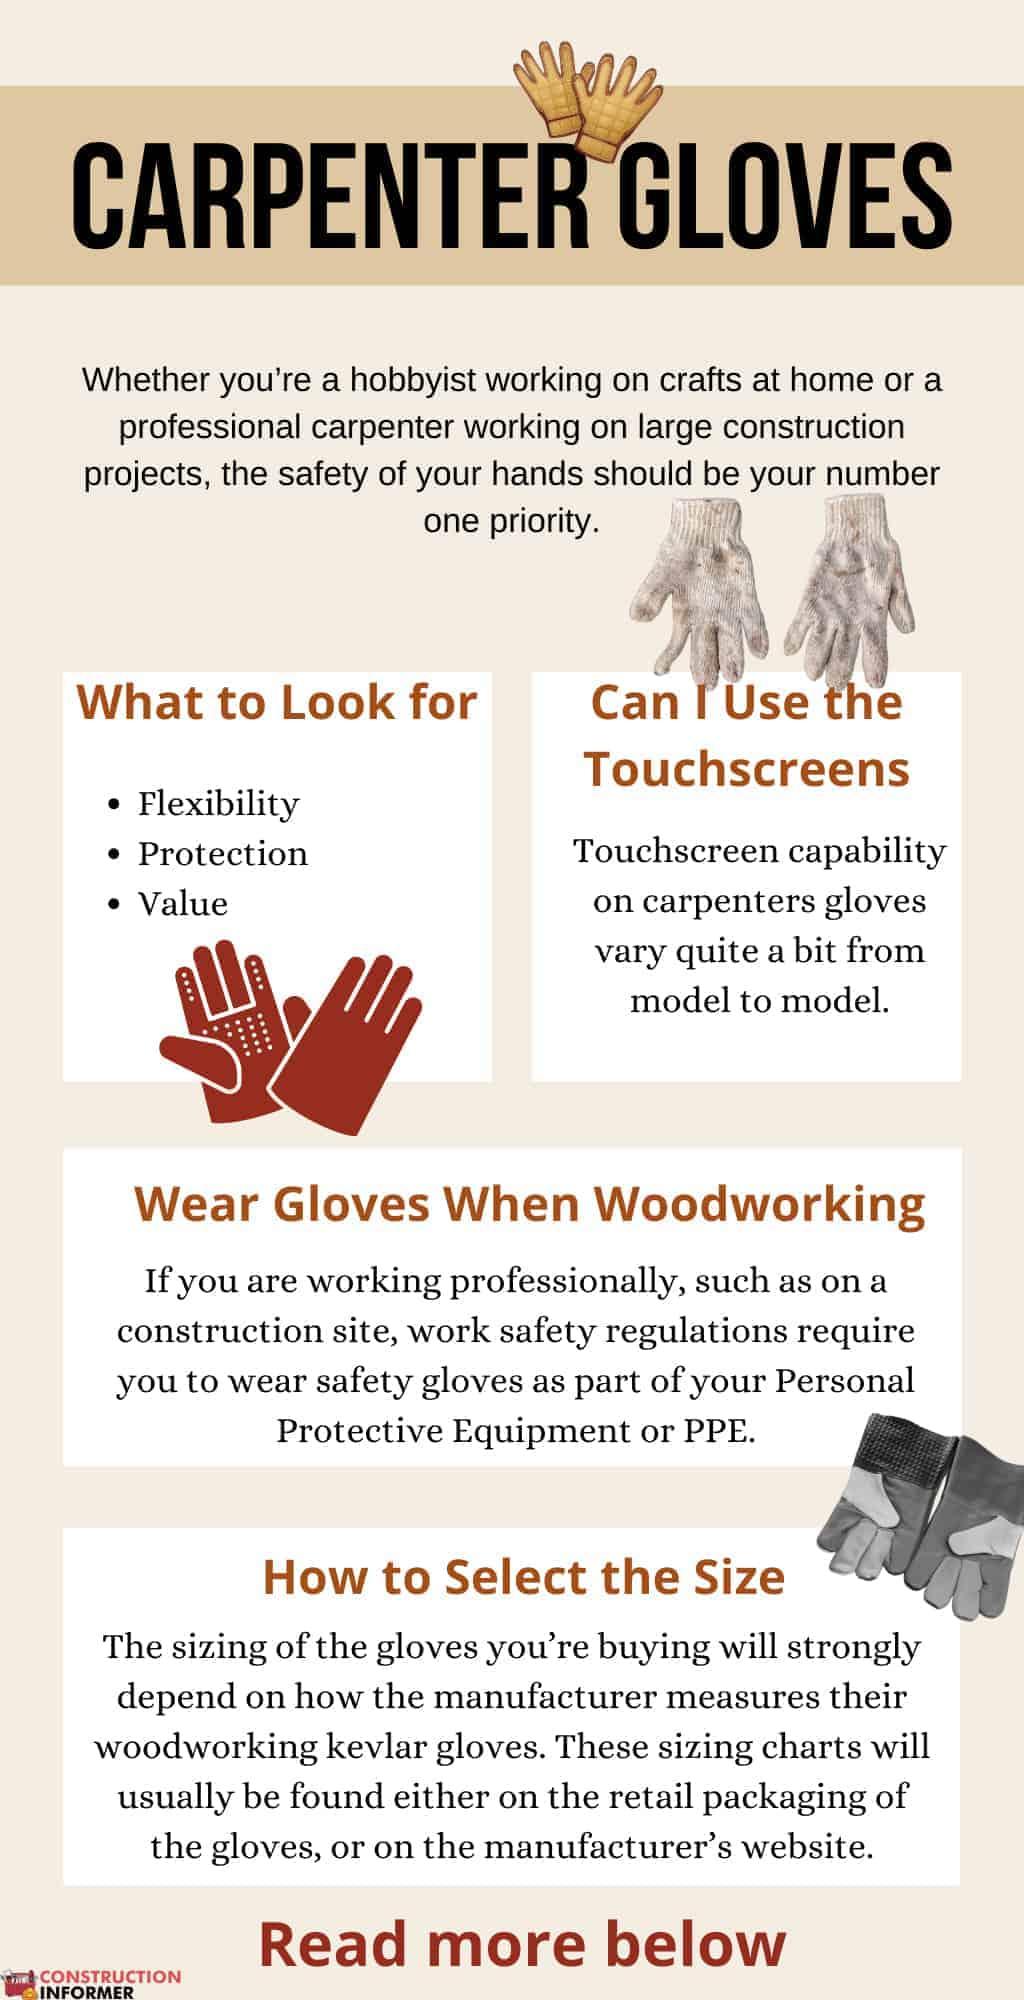 winter-gloves-for-carpenters